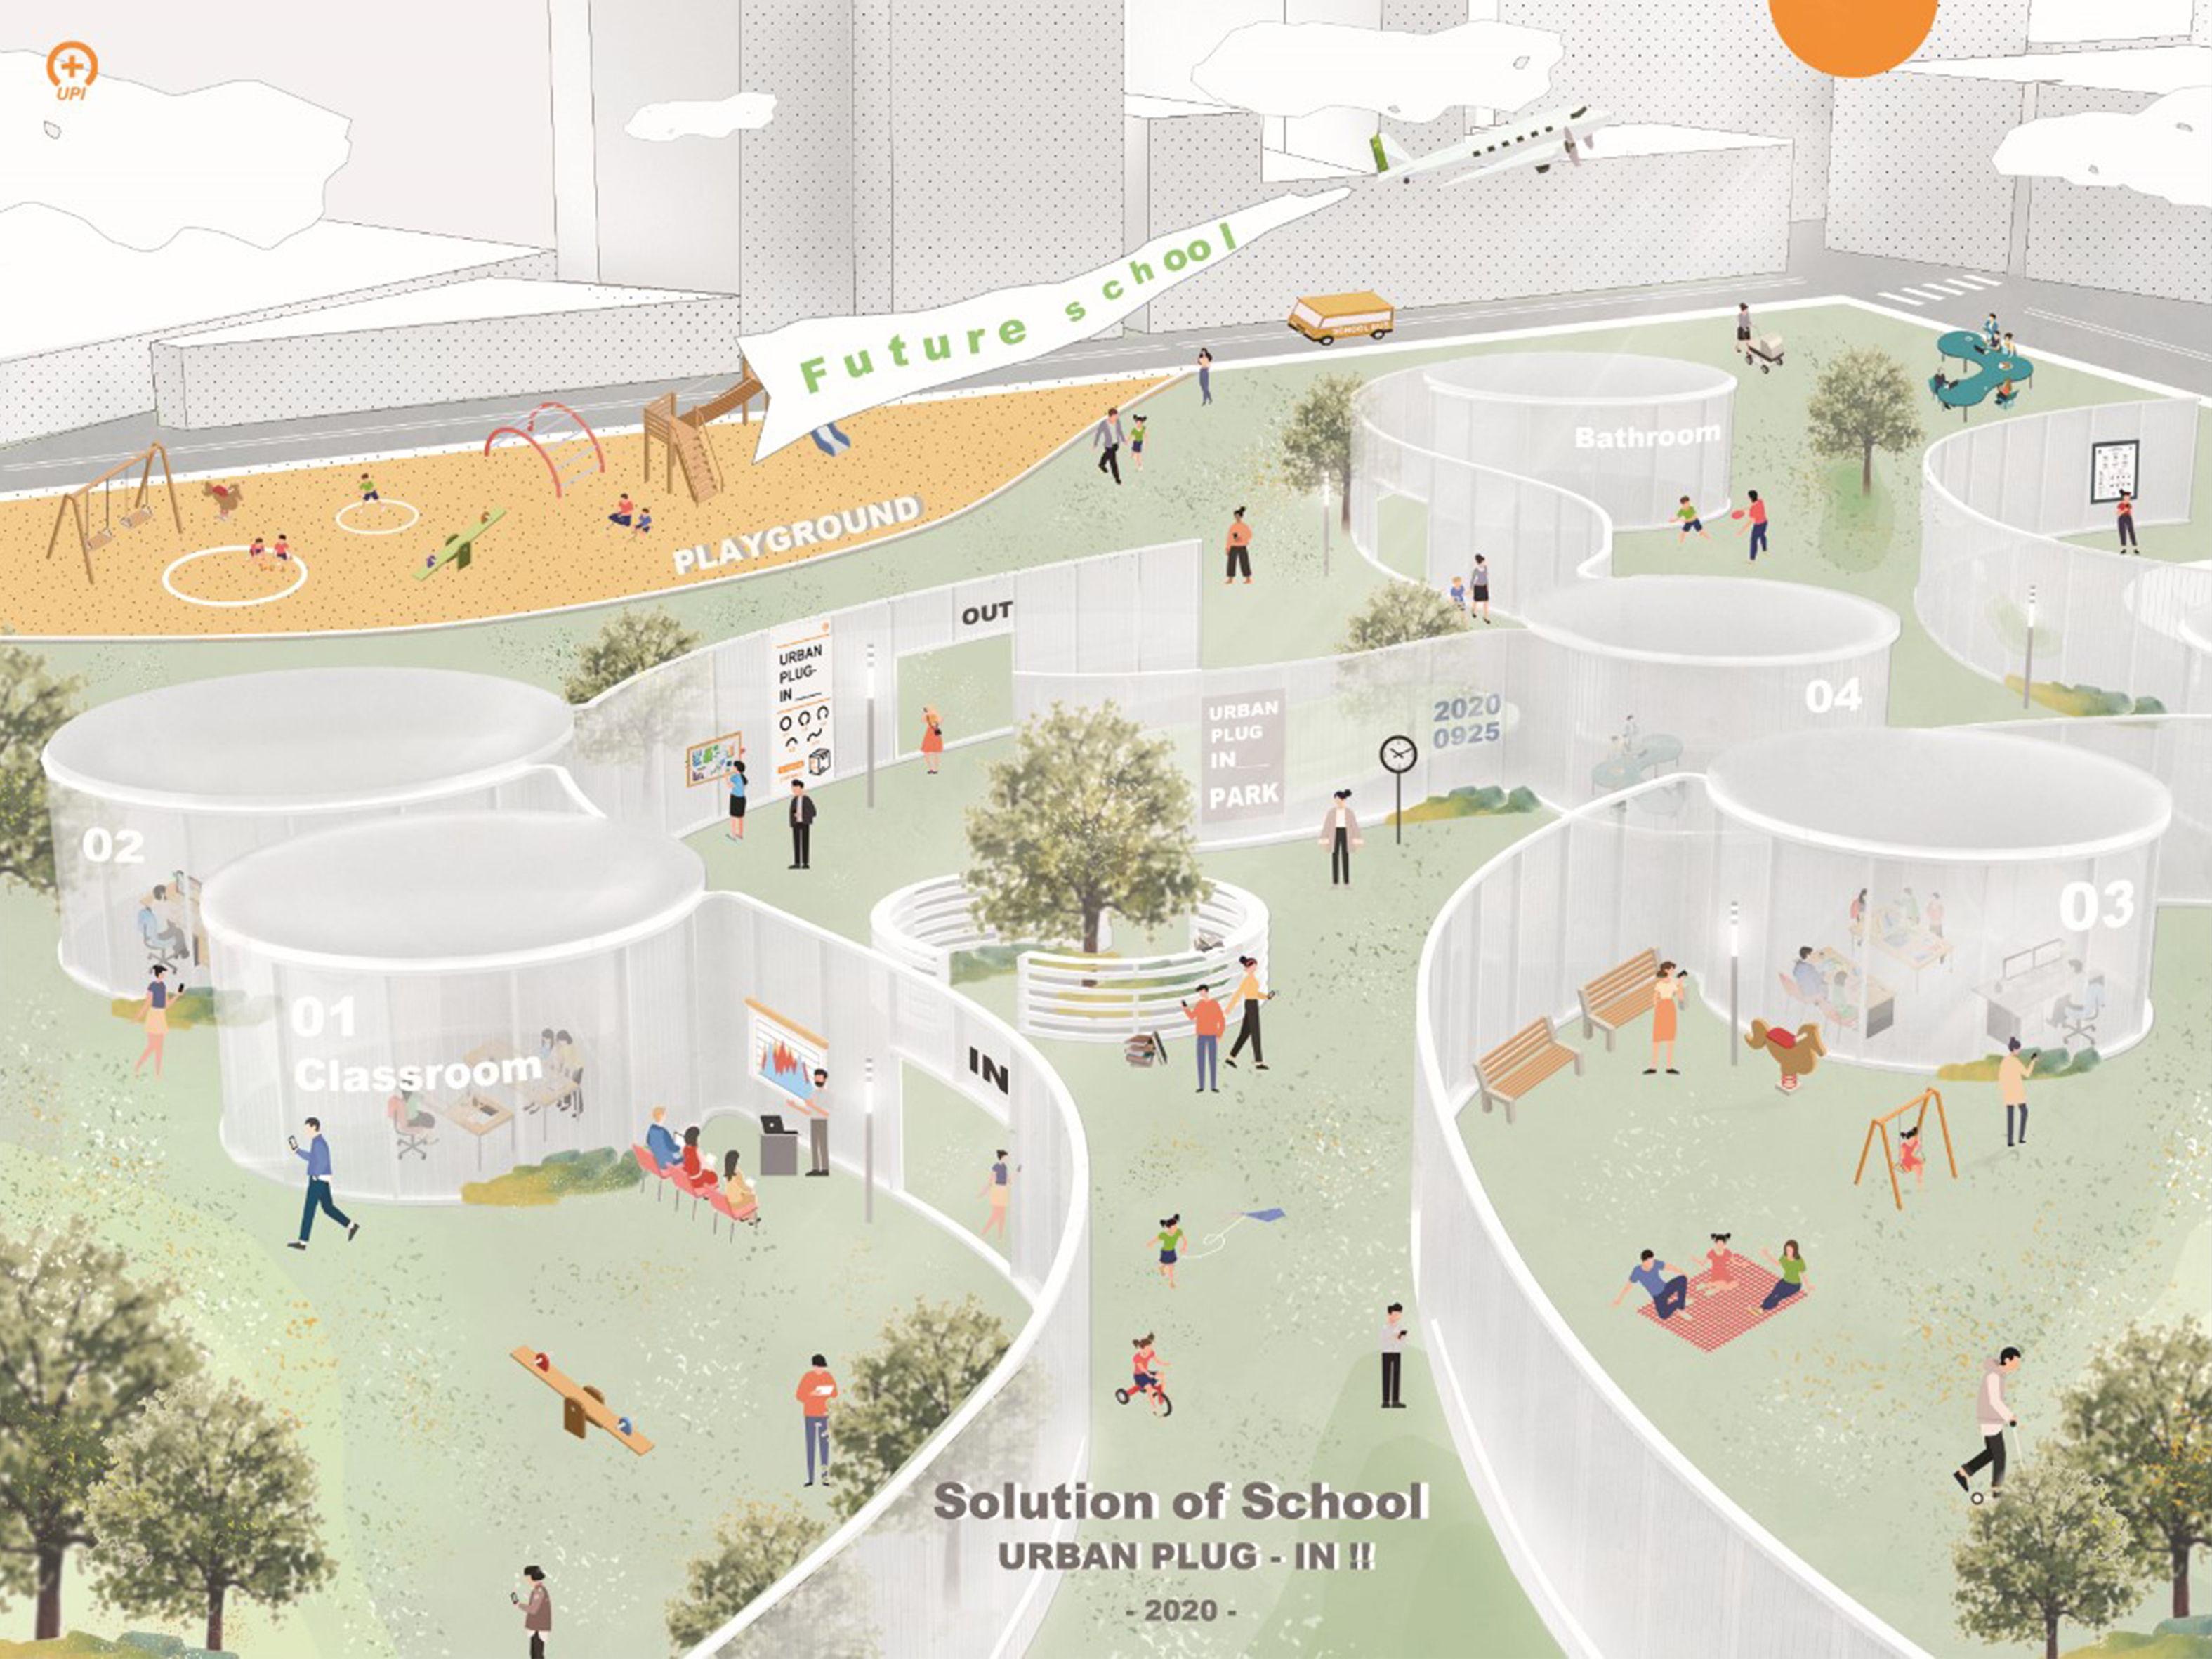 S.O.S-Solution Of School-urban plug-in!!